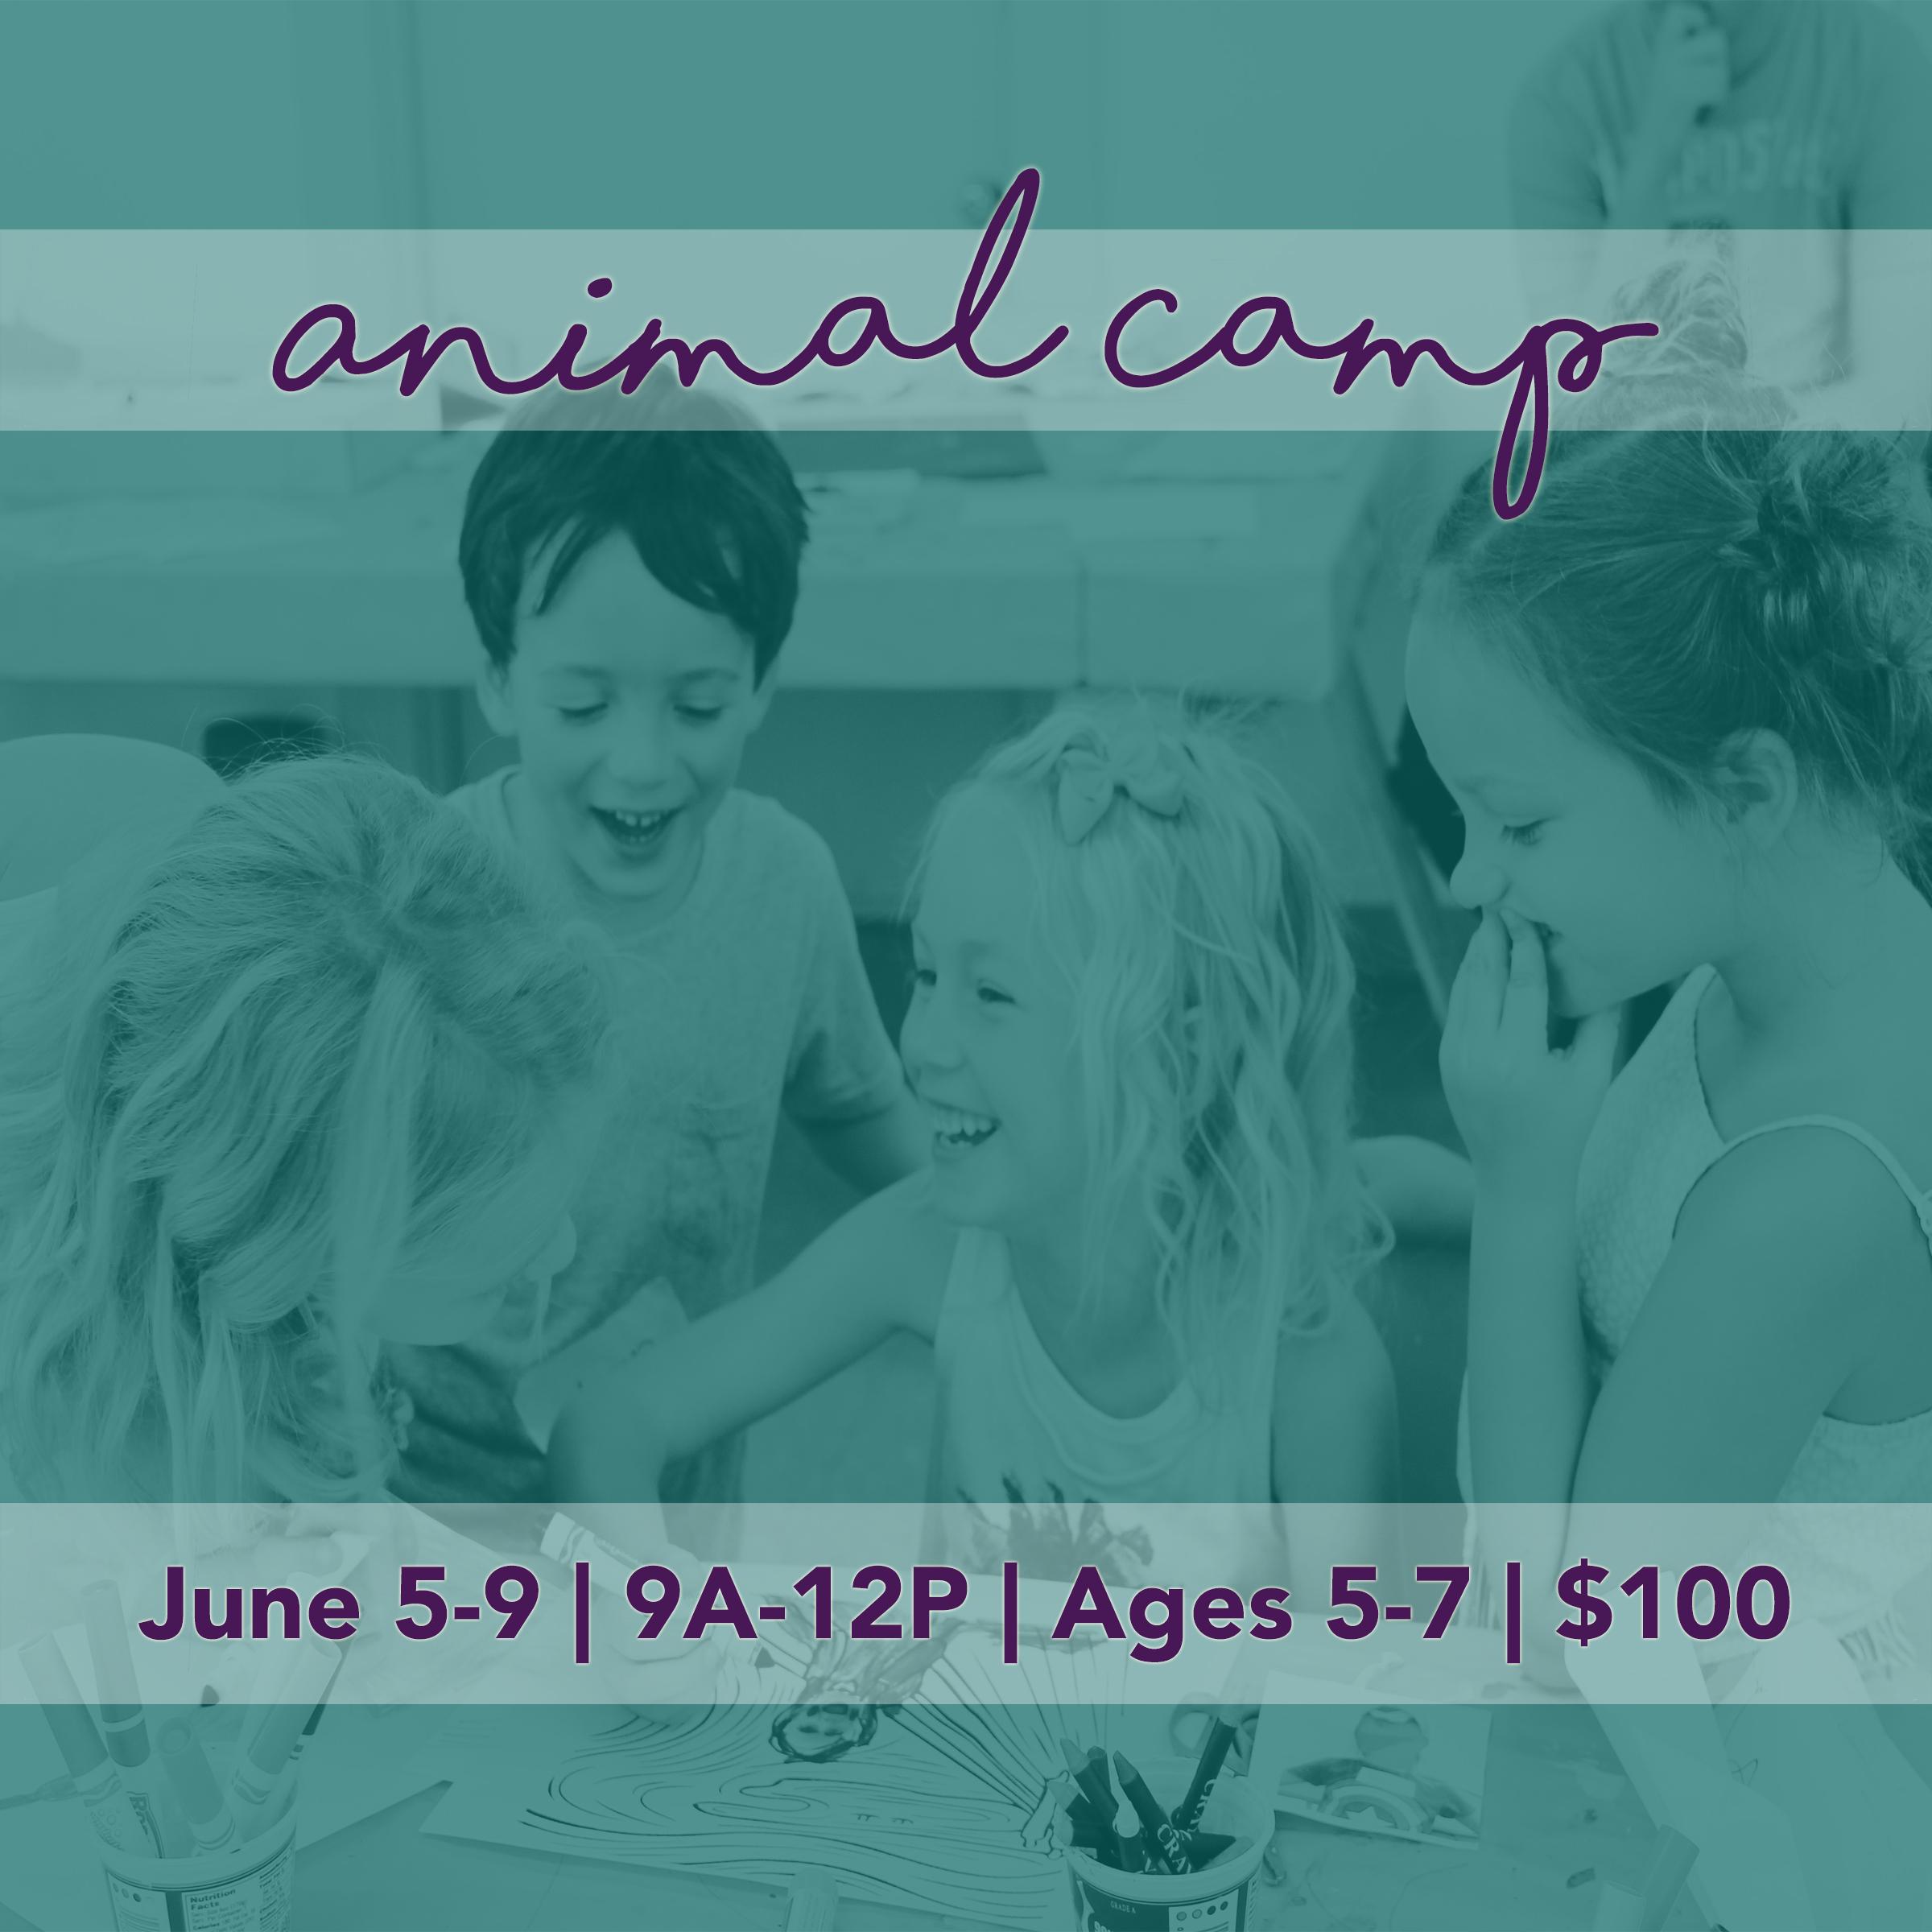 Animal Camp - The Art Center of Waco